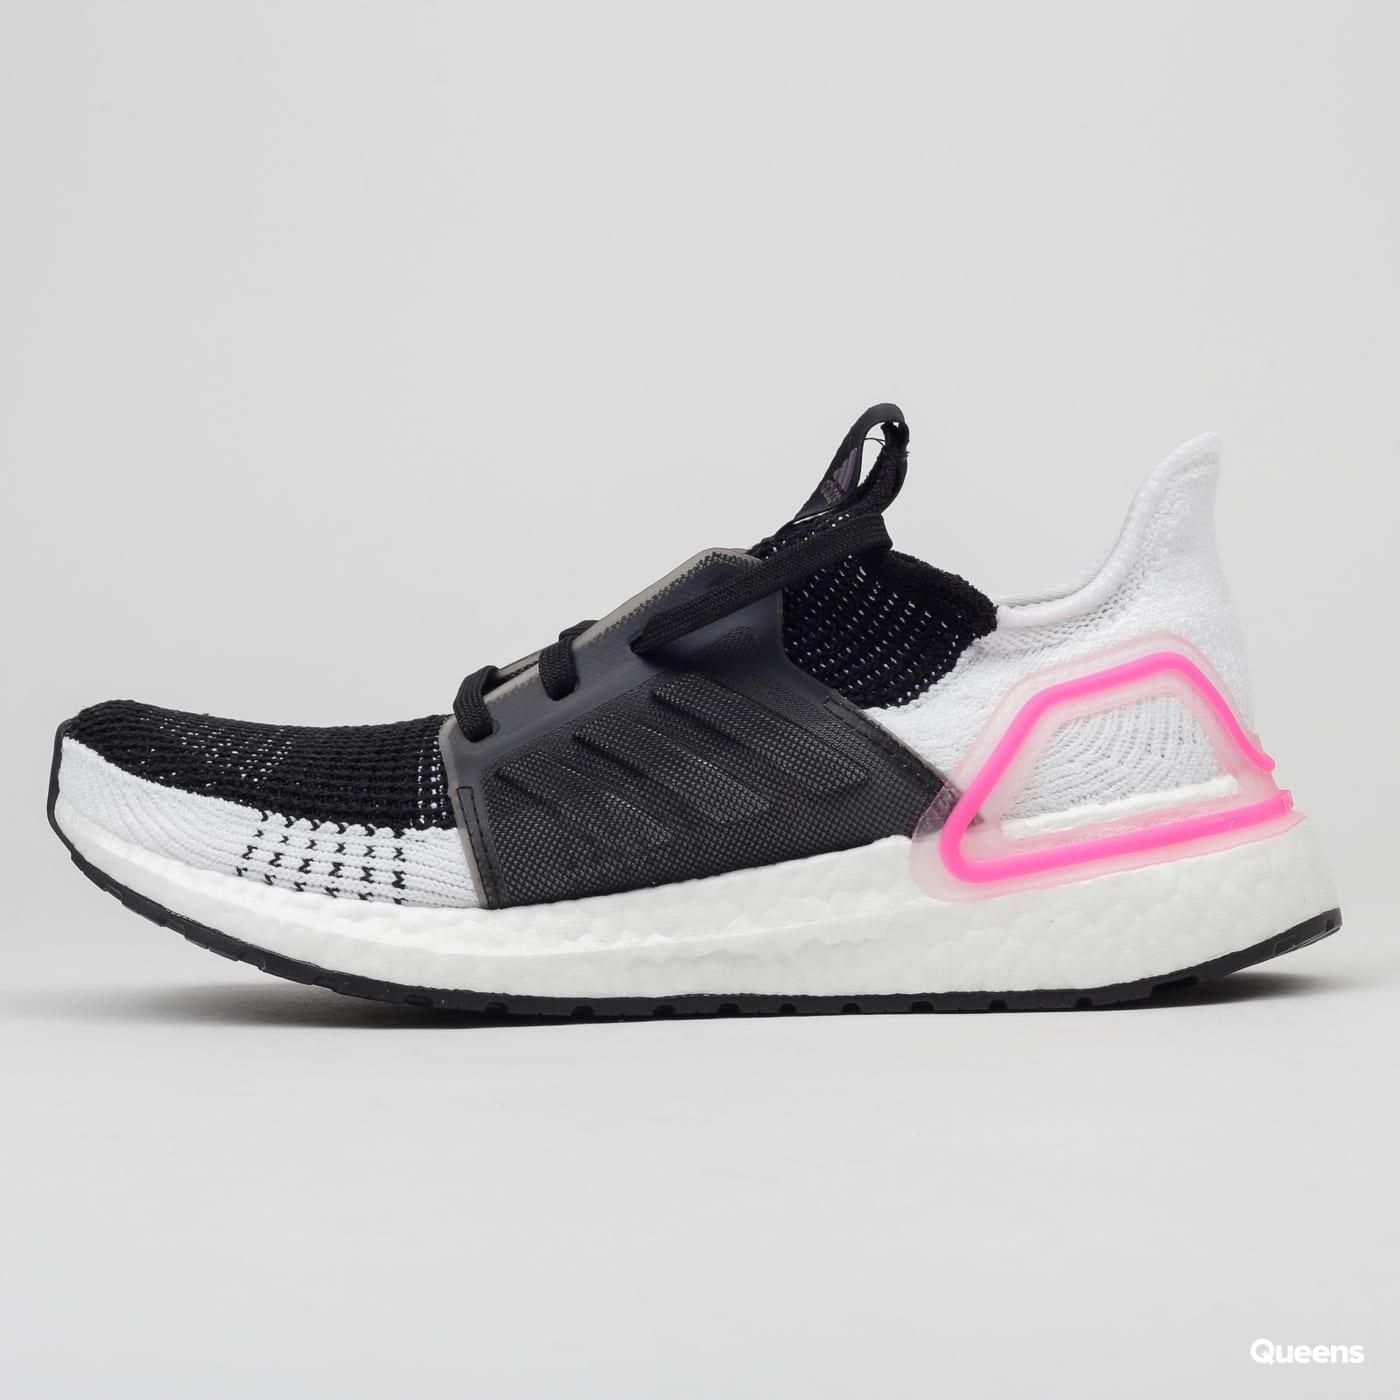 adidas Performance UltraBOOST 19 w cblack / cblack / could white